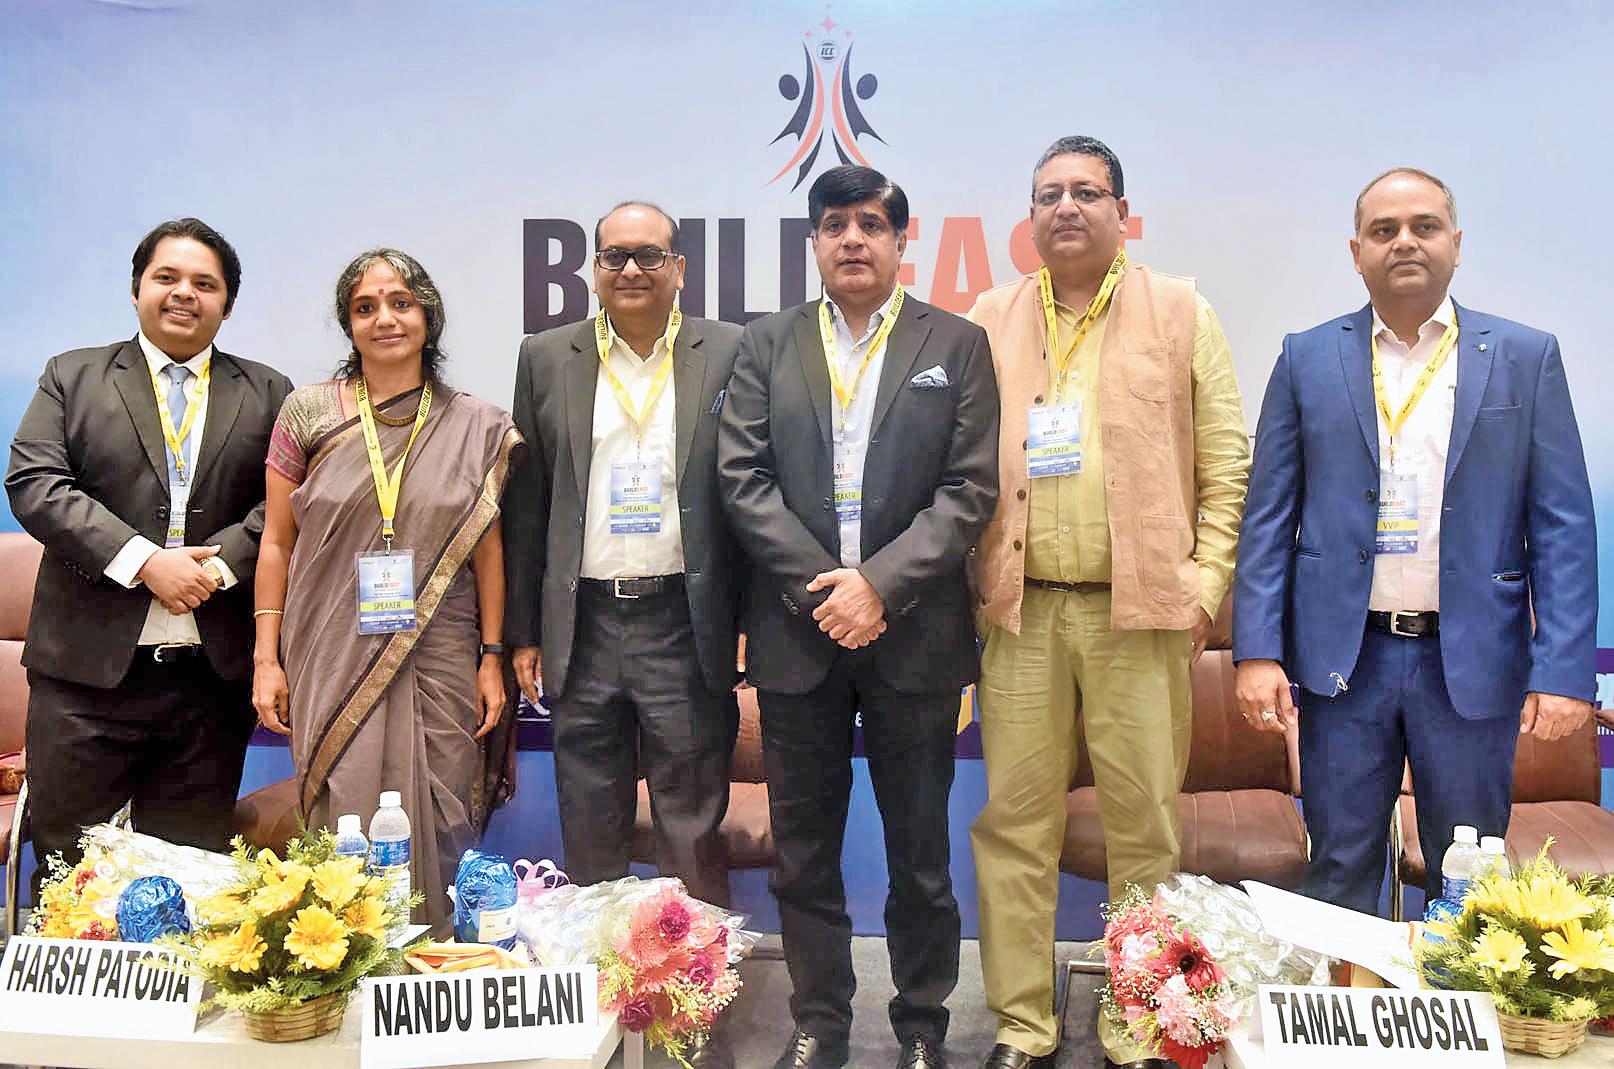 (From left) Rishi Jain of Jain Group; Gita Balakrishnan of the Indian Institute of Architects; Harsh Patodia of Unimark Group; Nandu Belani of Belani Group; Tamal Ghosal of Country Roads Resort and Pramod Ranjan Dwivedi of Ambuja Neotia Group at the meet on Tuesday.